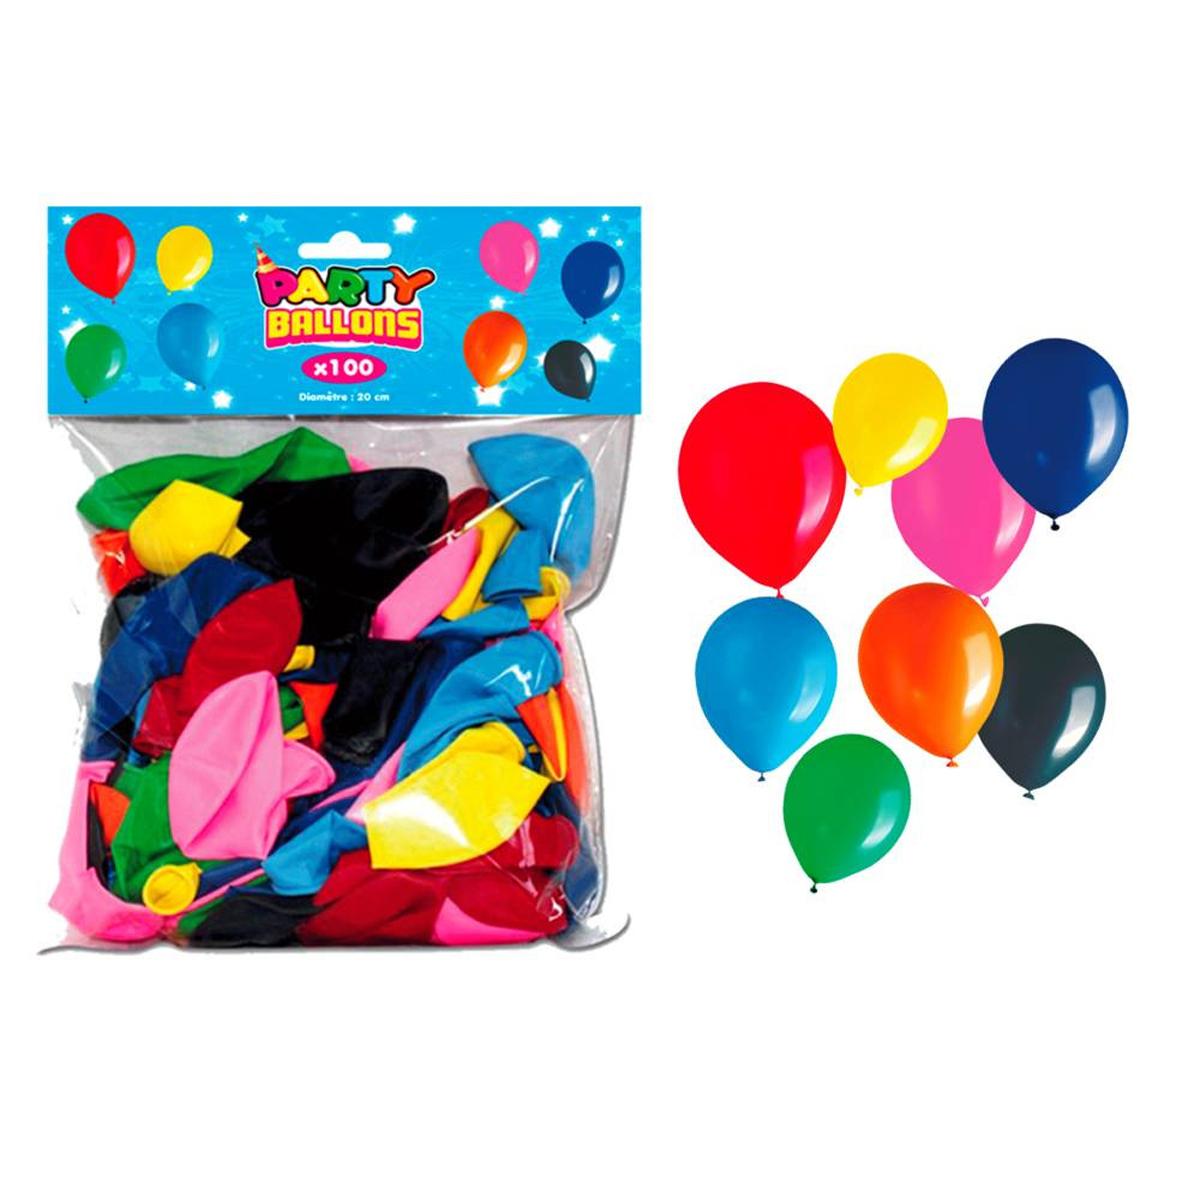 Sachet de 100 ballons \'Coloriage\' tutti frutti - [L4192]